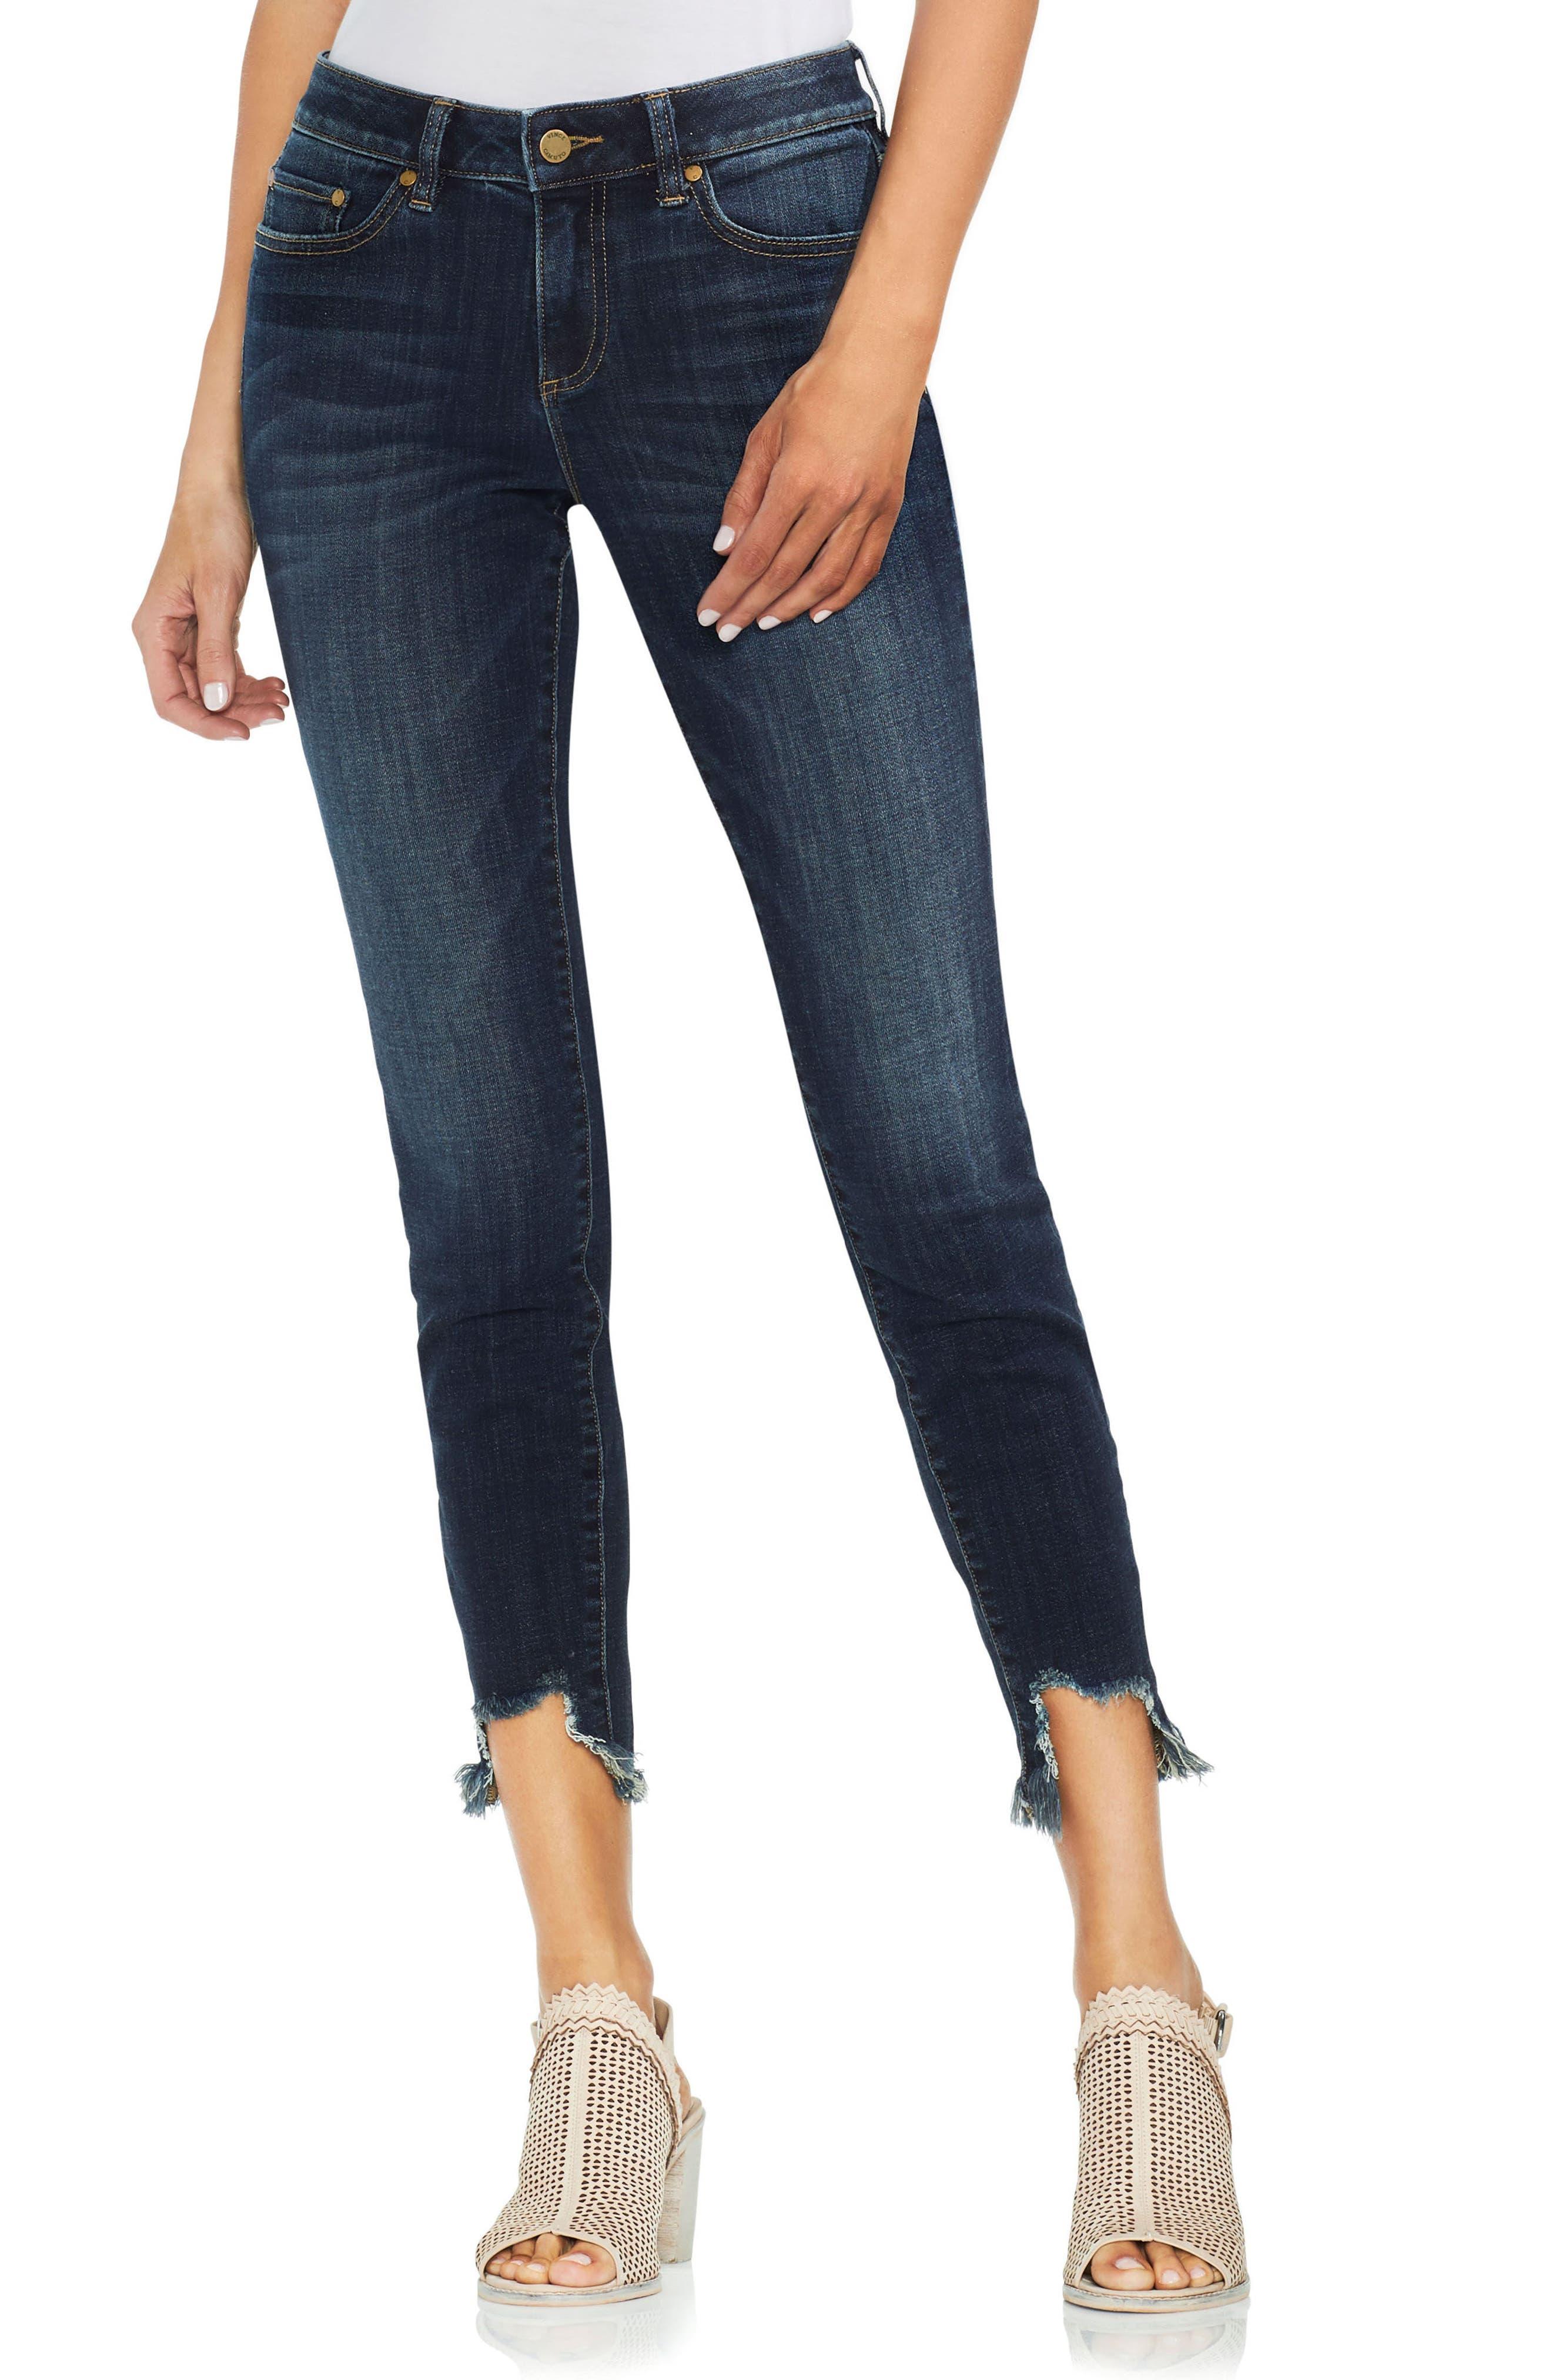 Vince Camuto Uneven Hem Skinny Jeans